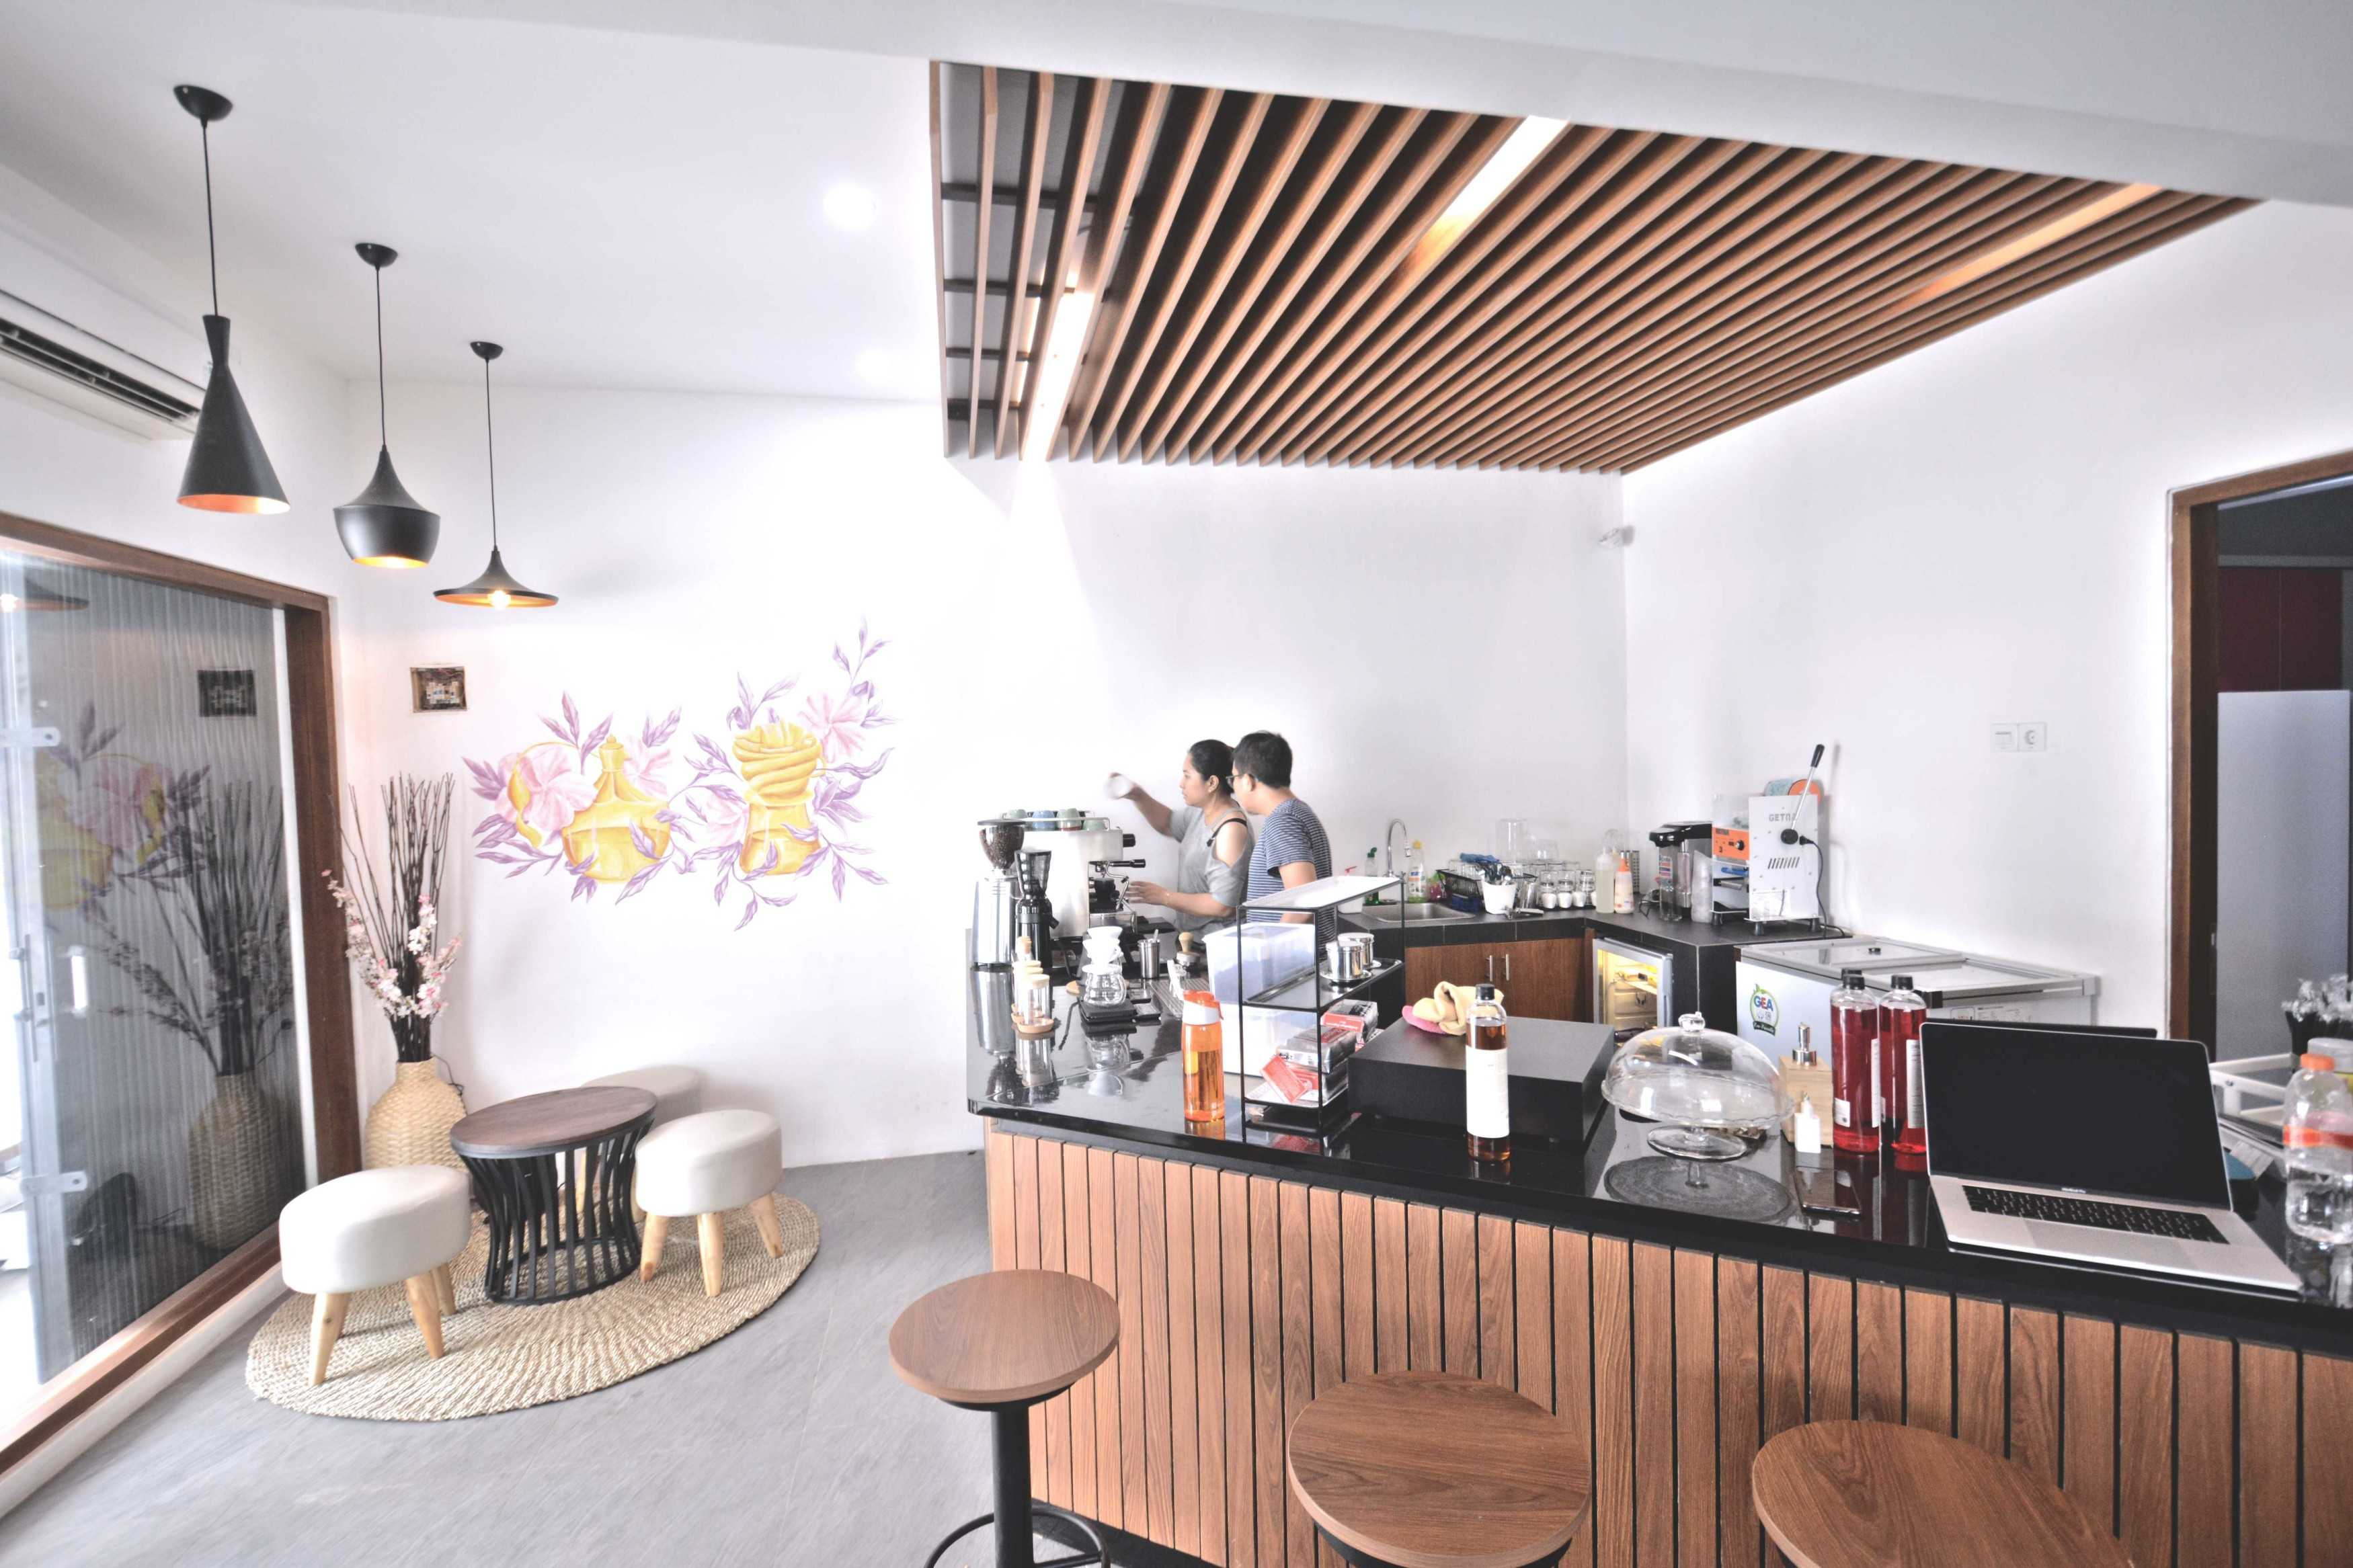 Mki Ts Cafe Jakarta Timur, Kota Jakarta Timur, Daerah Khusus Ibukota Jakarta, Indonesia Jakarta Timur, Kota Jakarta Timur, Daerah Khusus Ibukota Jakarta, Indonesia Mki-Ts-Cafe   92243